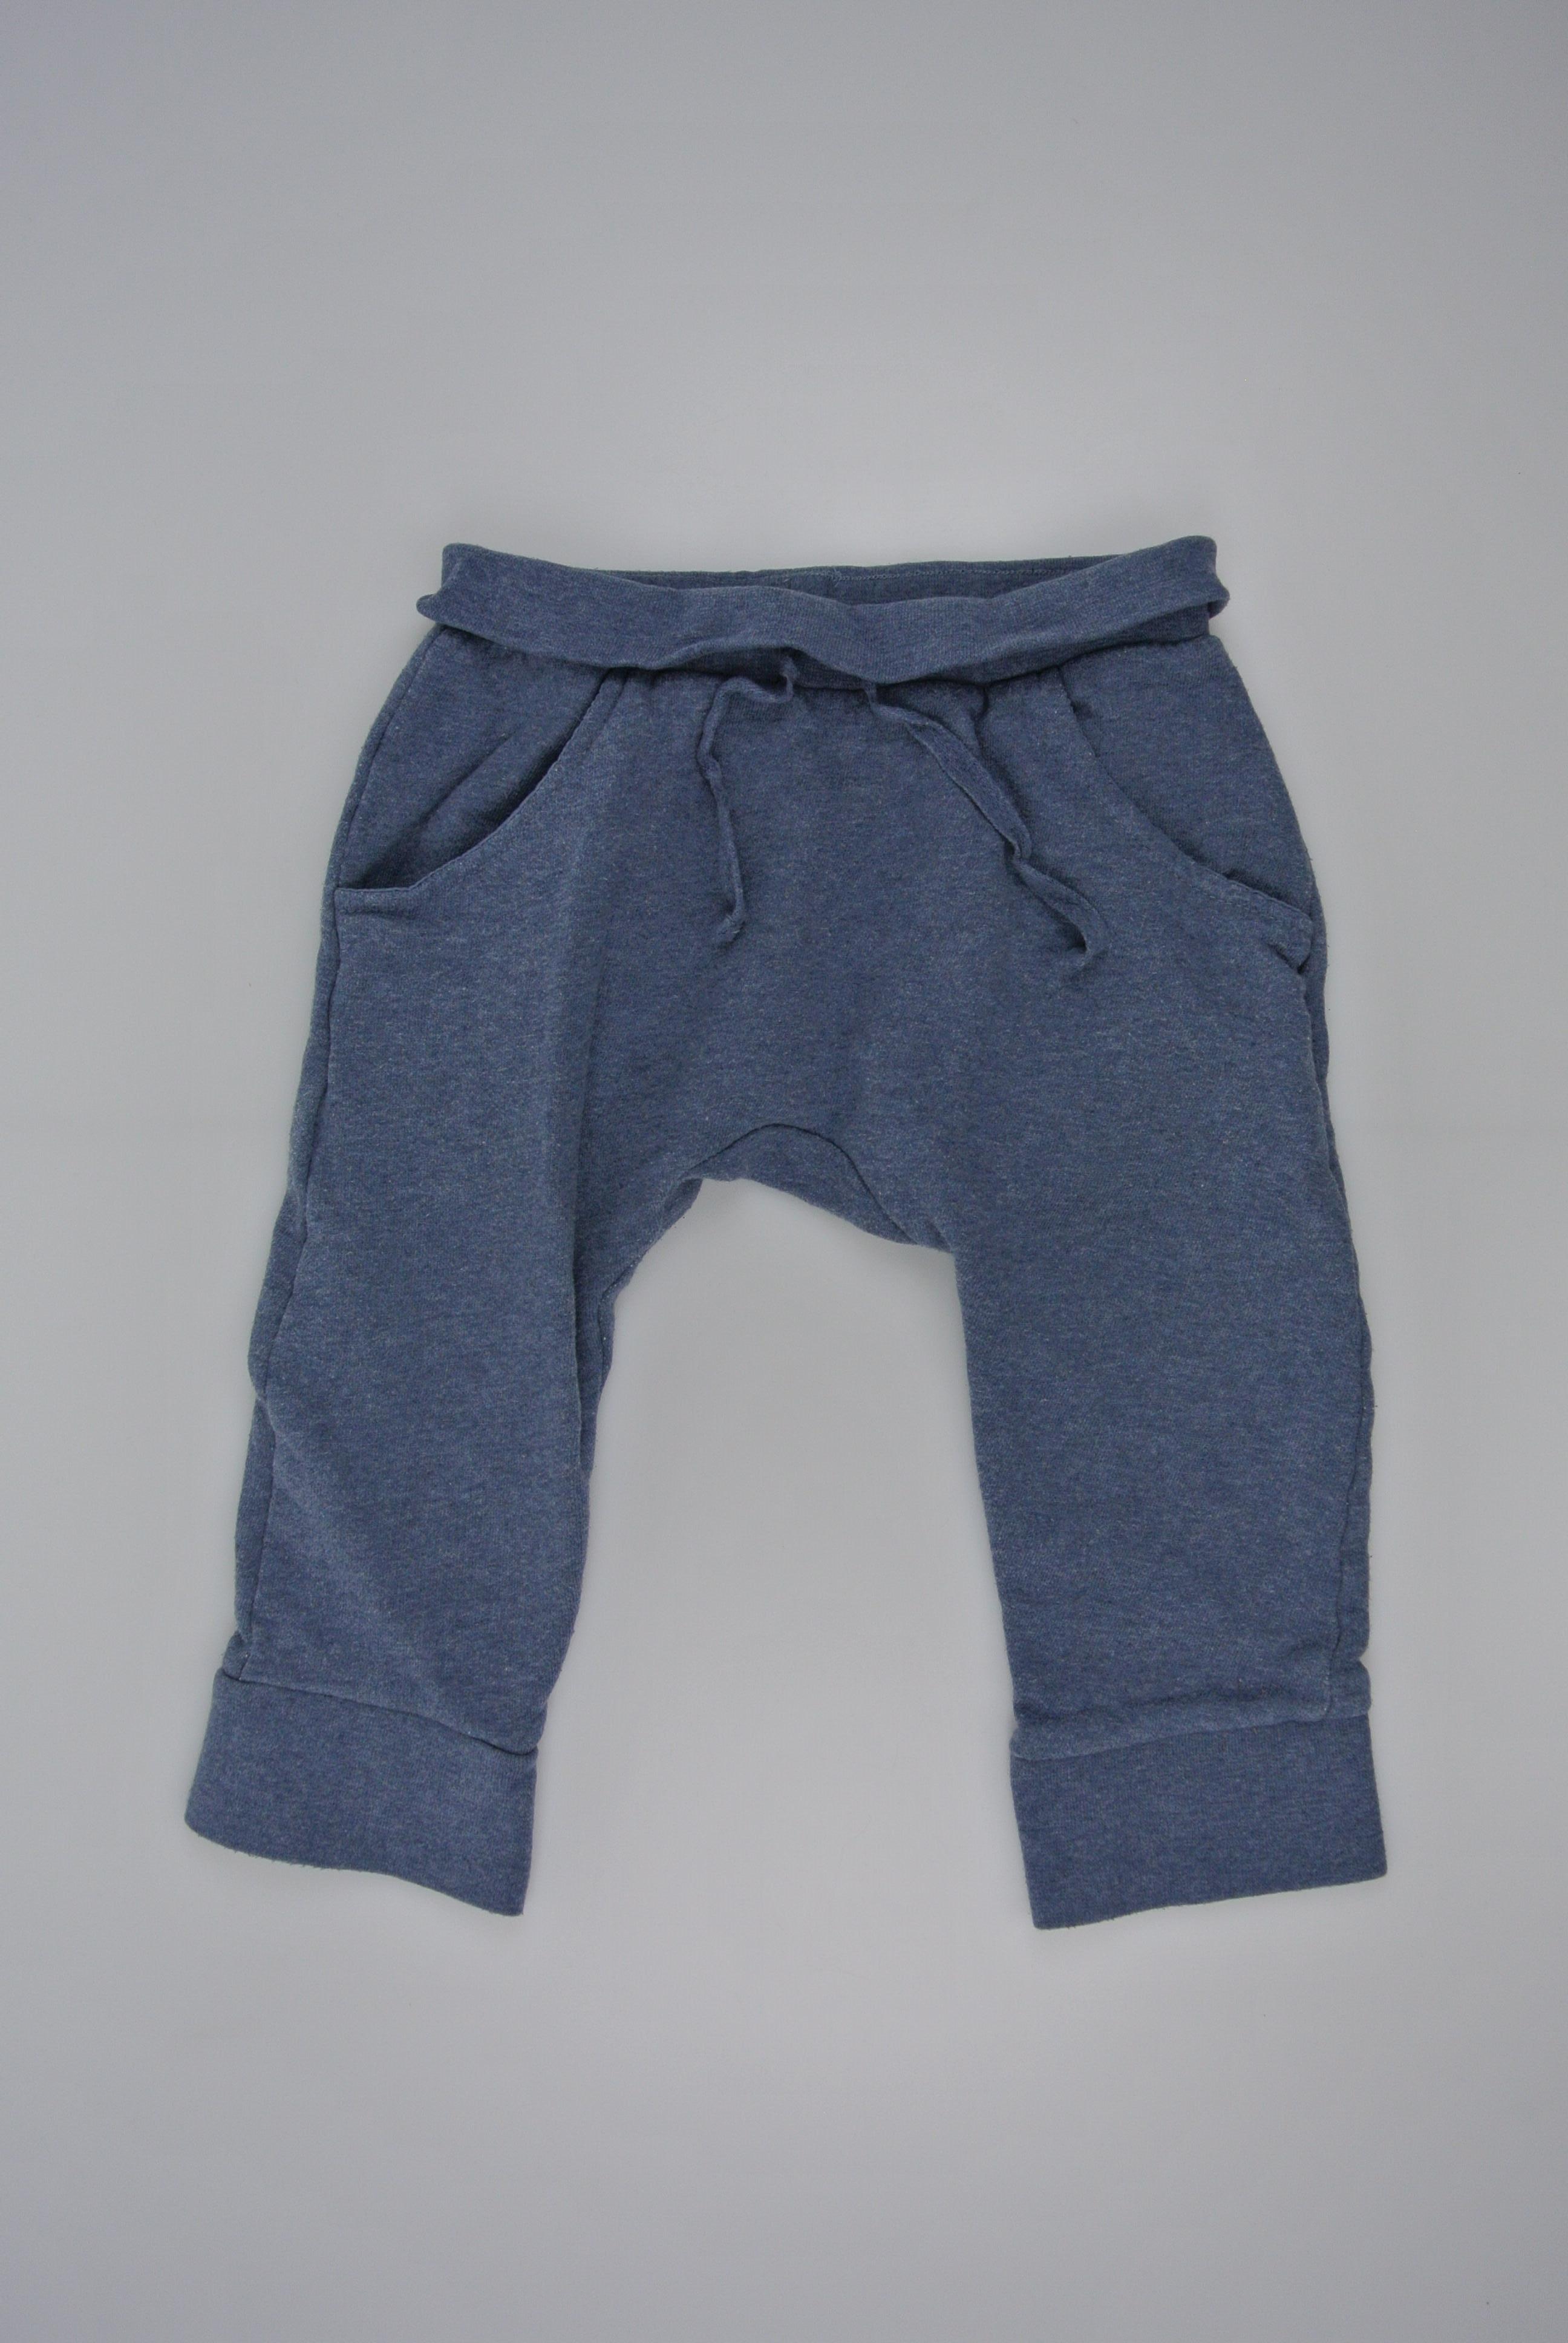 Marmar bukser str 92 dreng